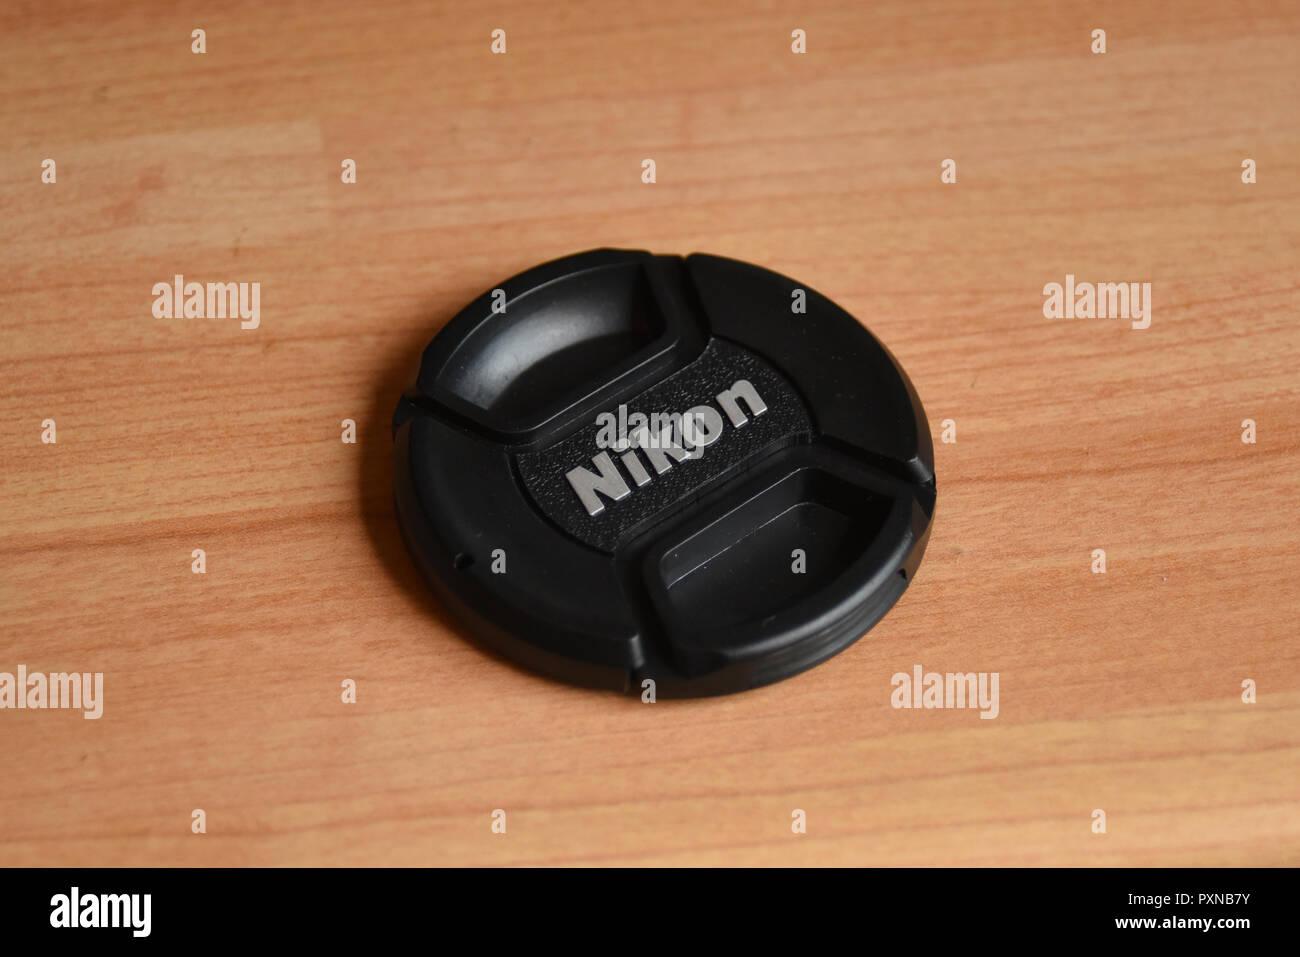 Nikon Lens Cap - Stock Image